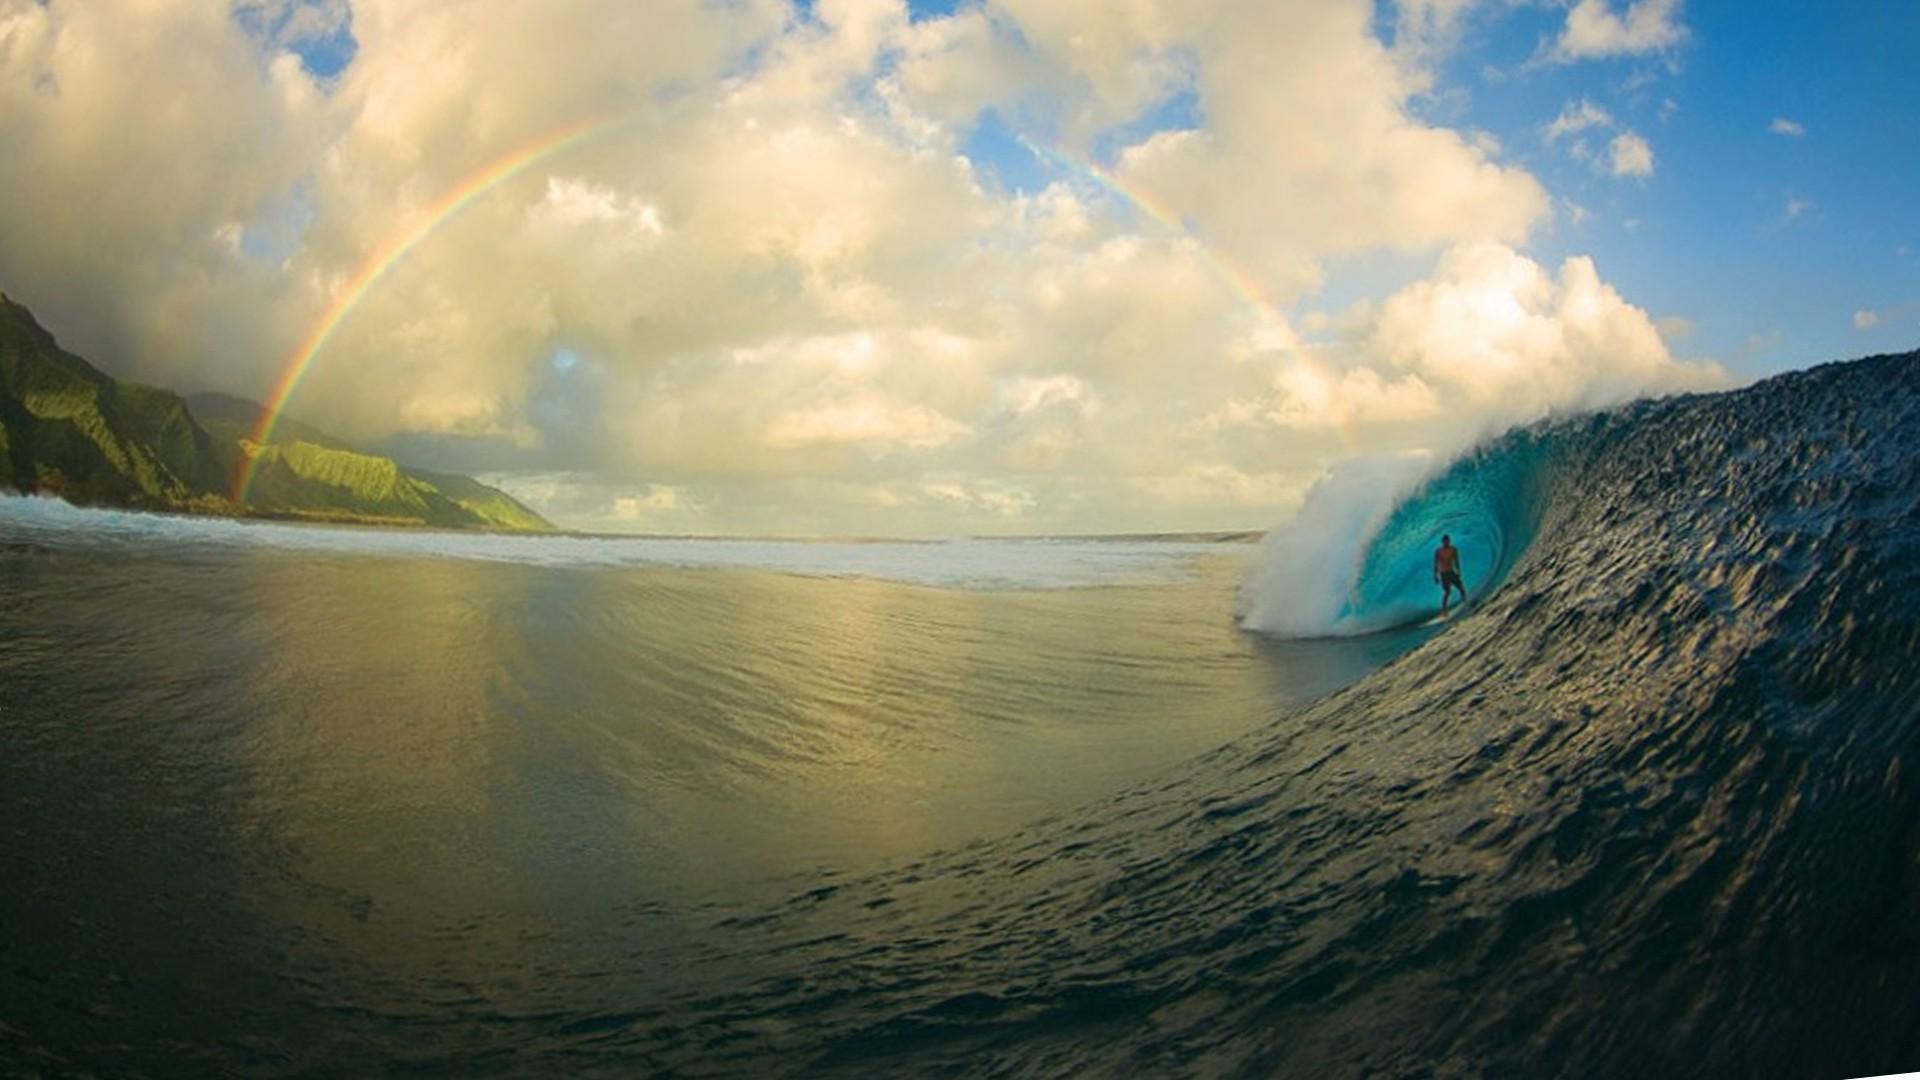 Surfing Rainbows 21662 Wallpaper Wallpaper hd 1920x1080